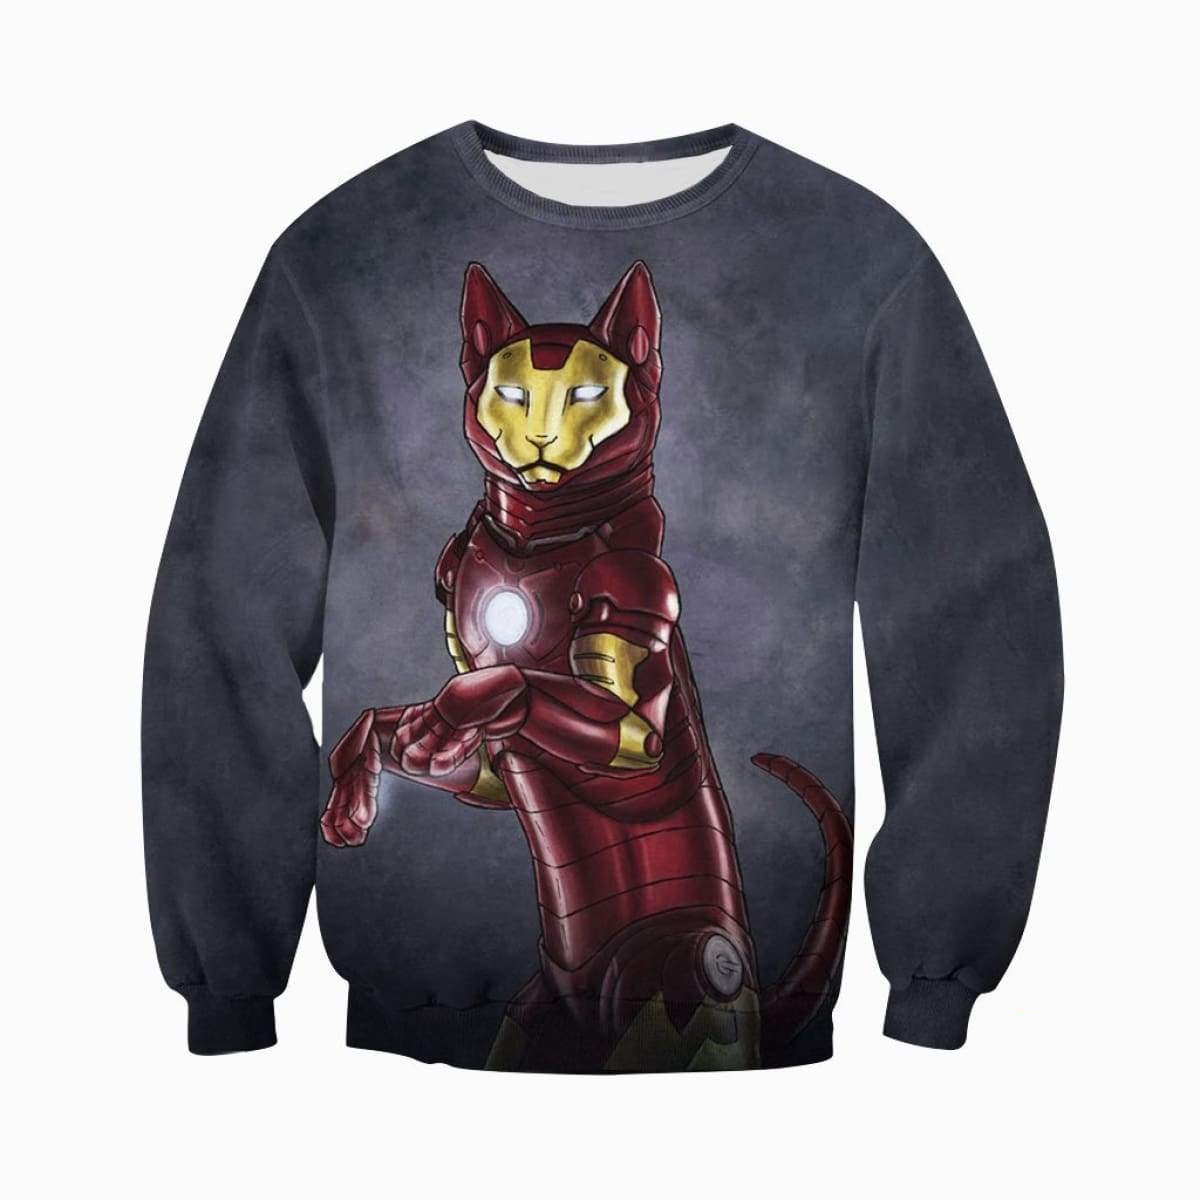 Avengers iron man iron cat all over print sweatshirt